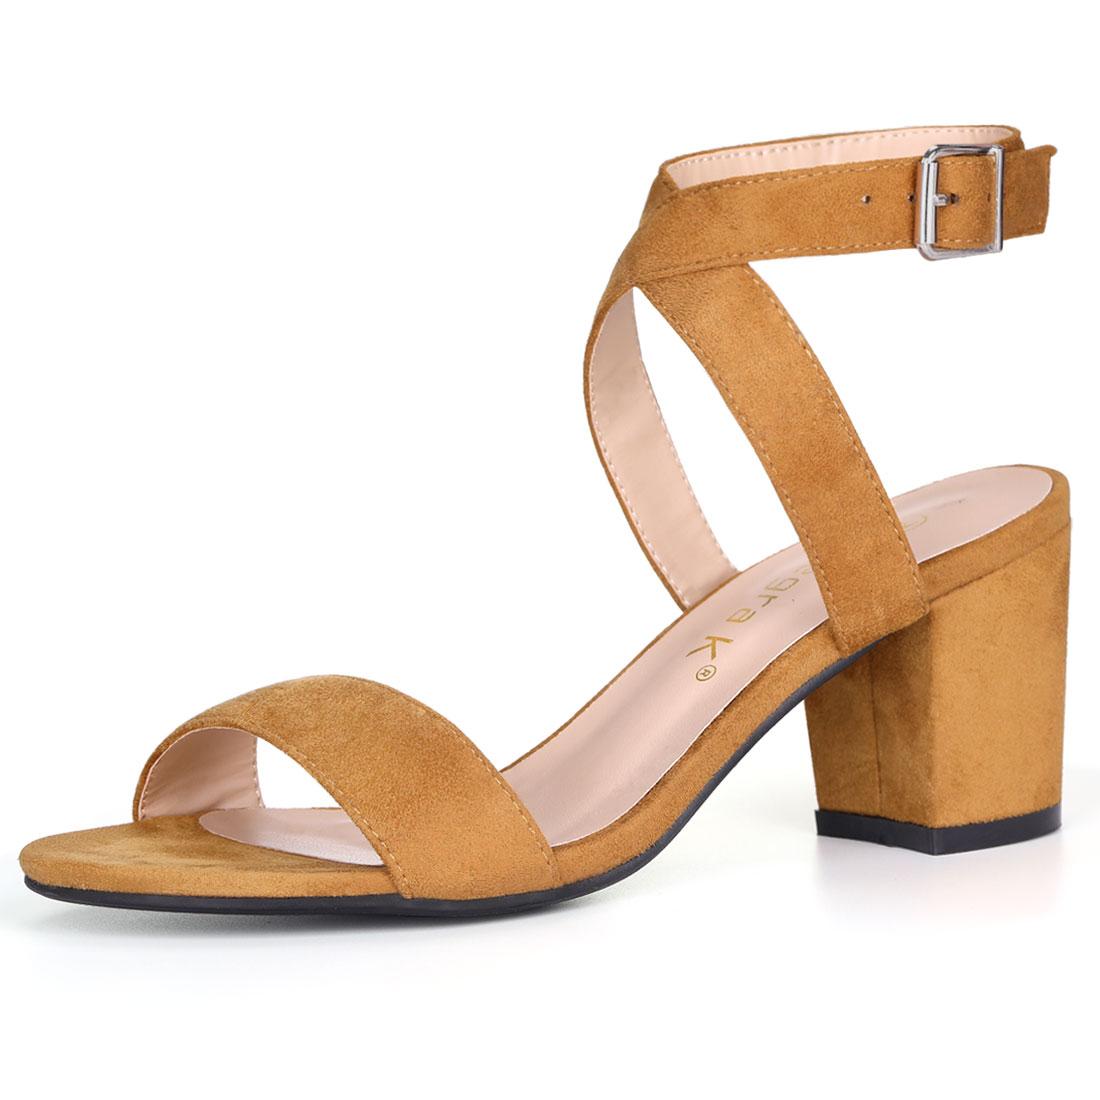 Allegra K Women's Crisscross Mid Block Heel Ankle Strap Sandals Brown US 10